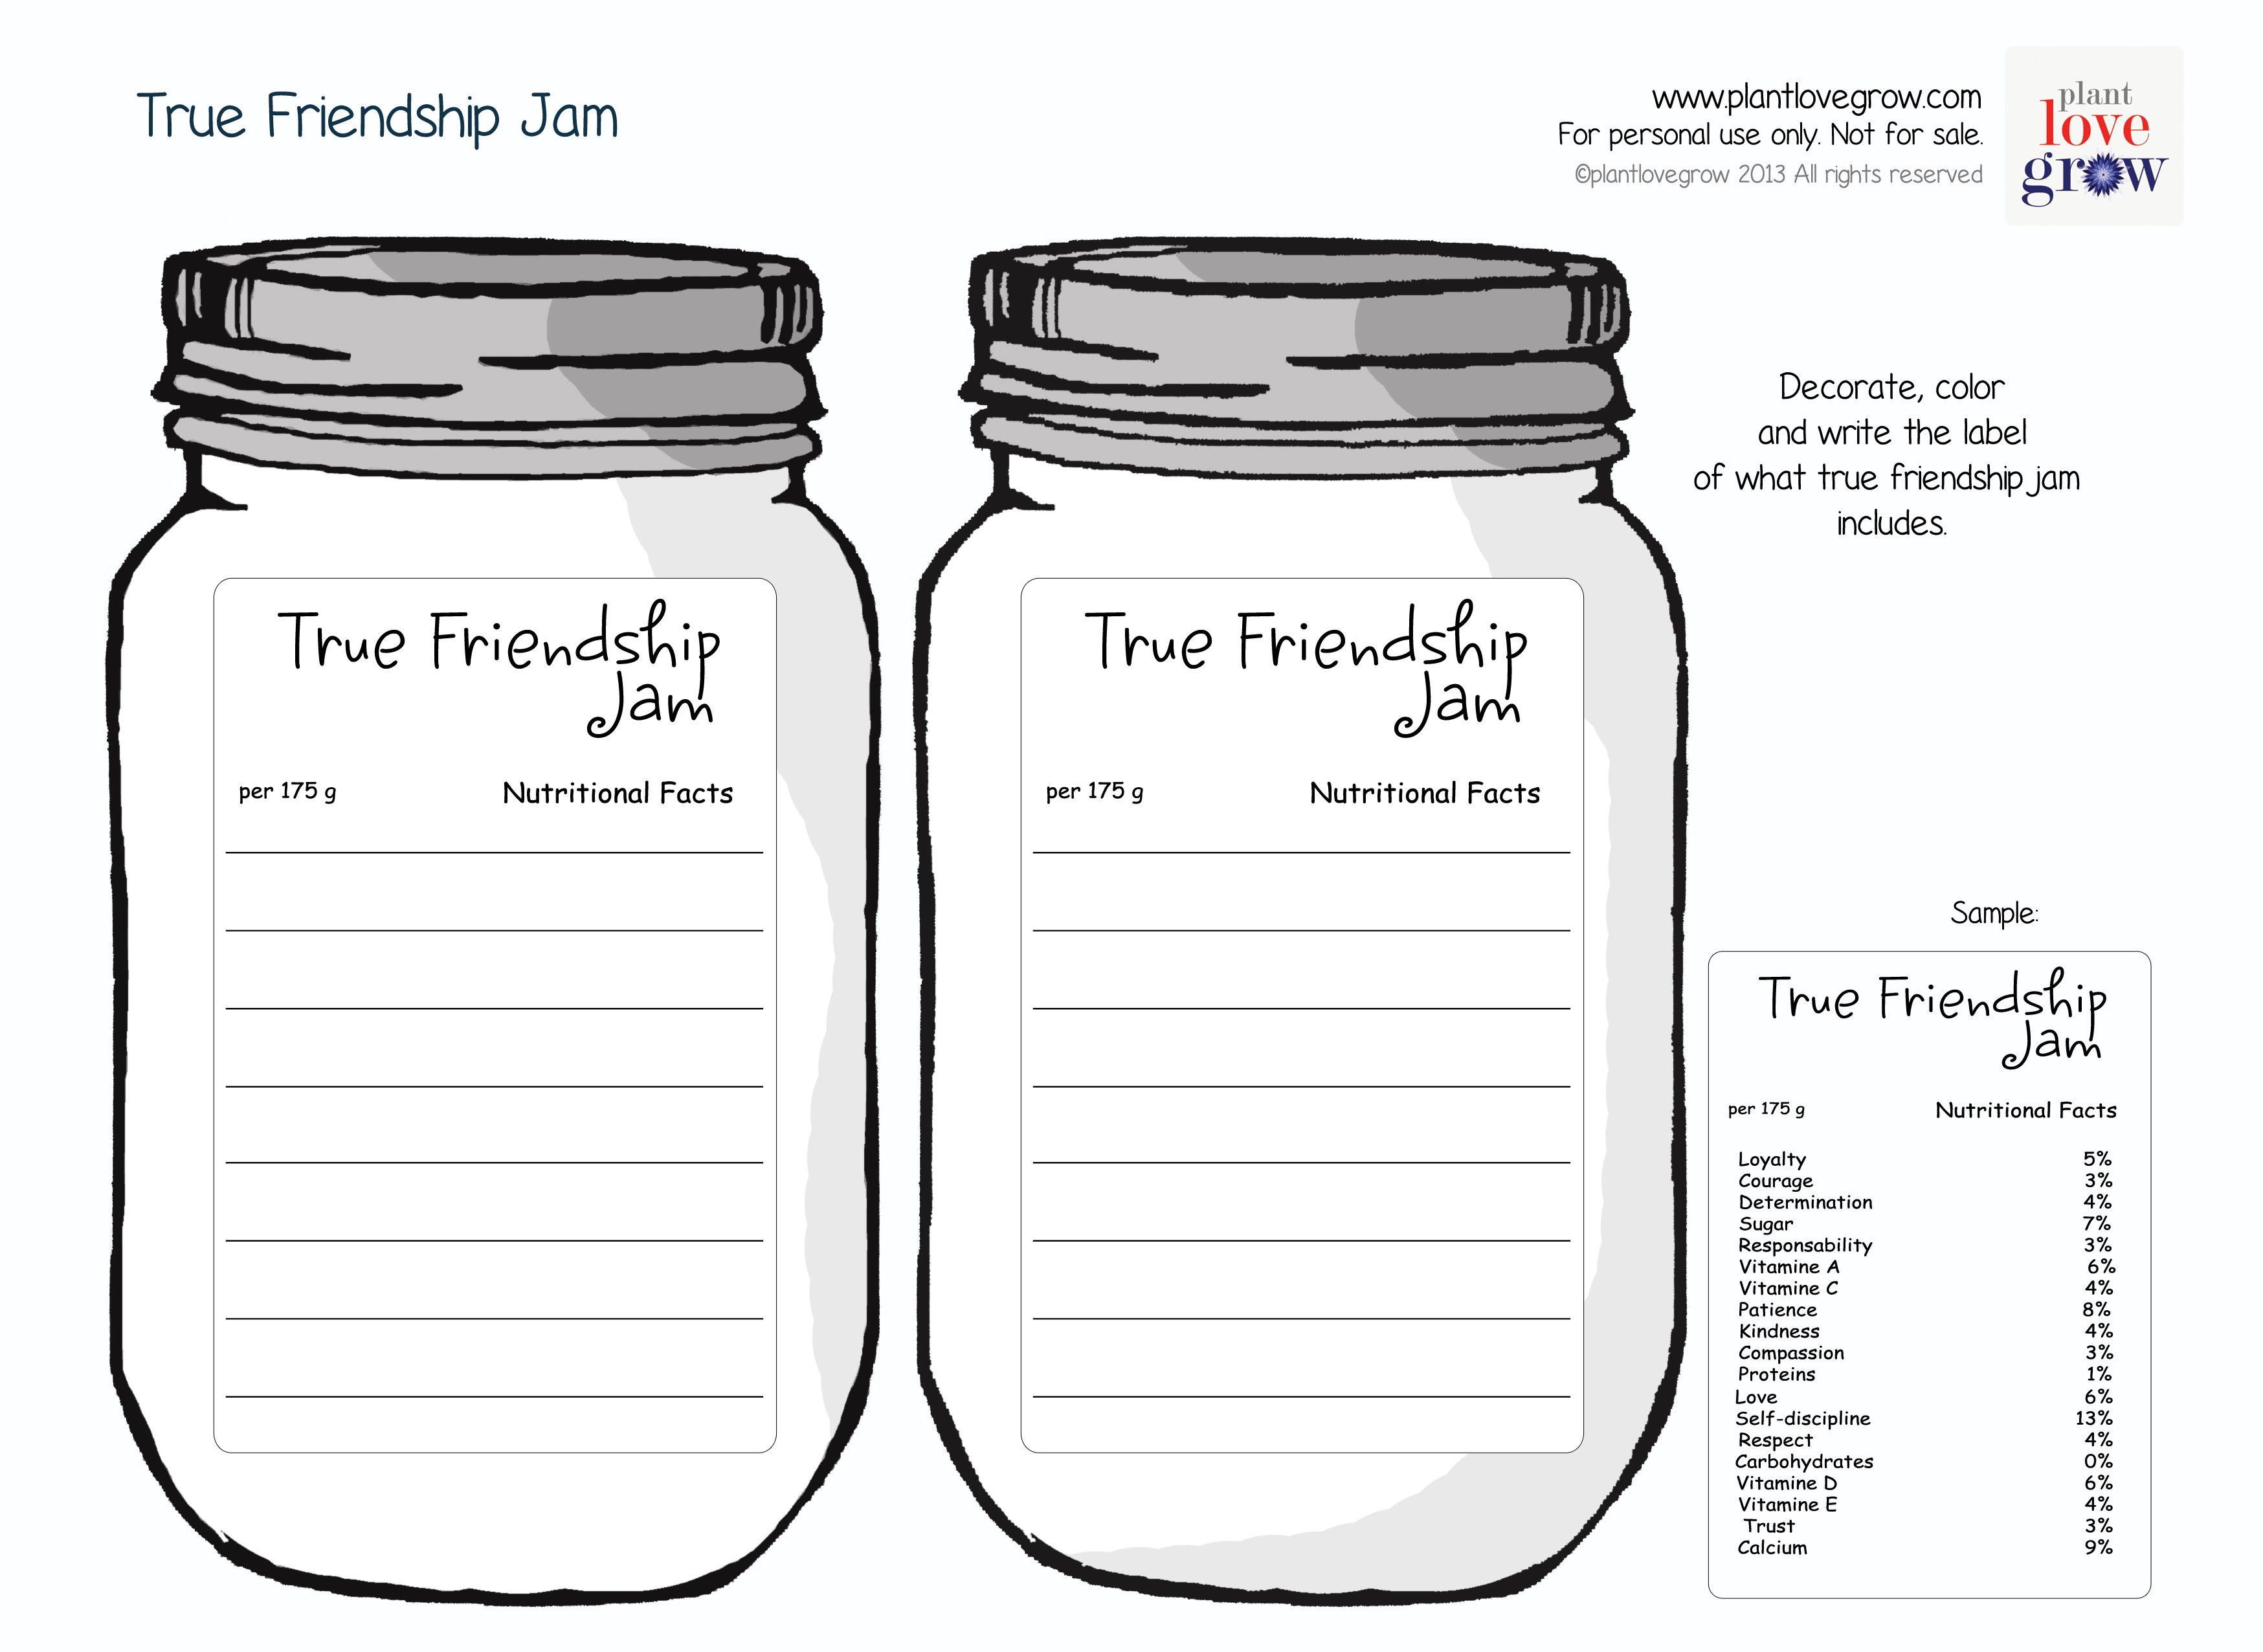 True Friendship Jam Ingre Nts What Goes Into True